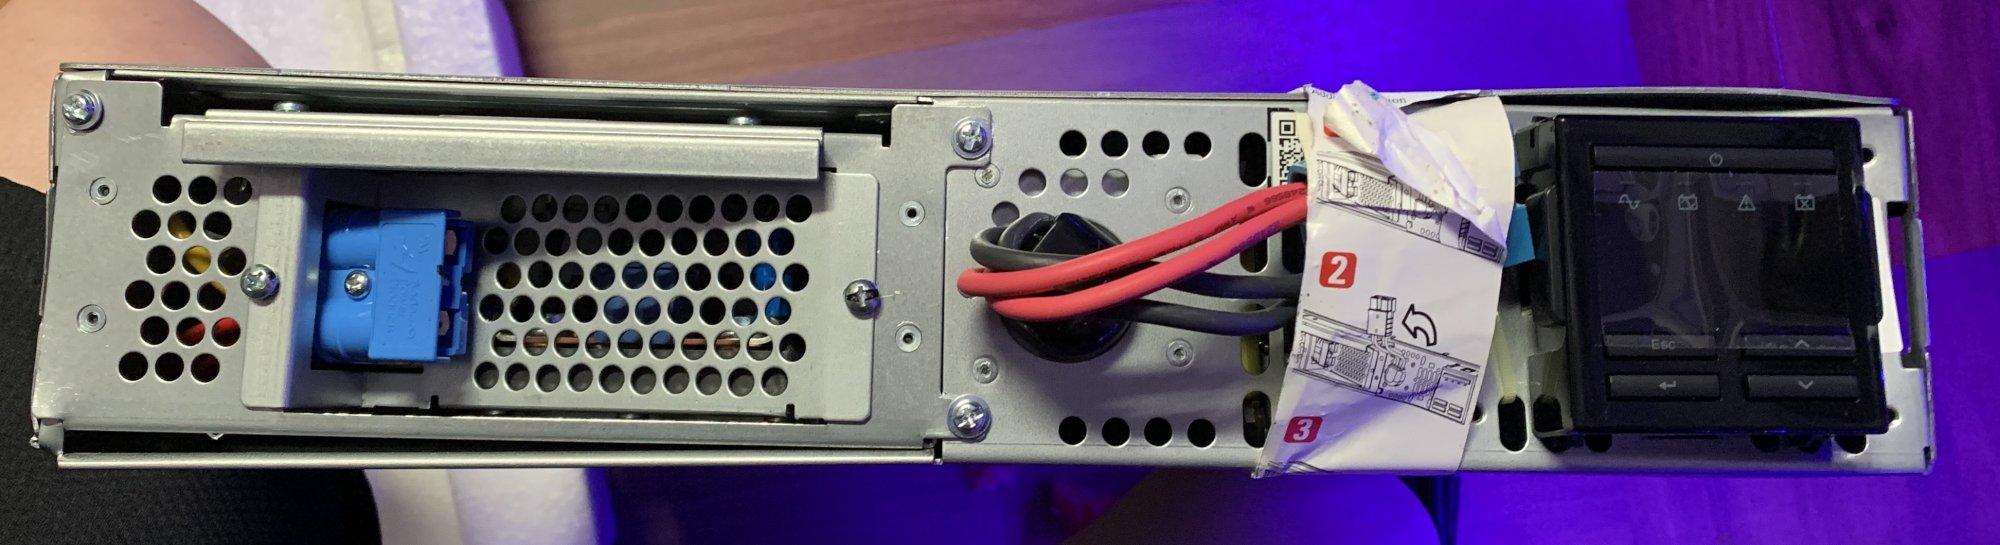 3F06680D-A566-49AD-BC12-BCABE07D9C79.jpeg